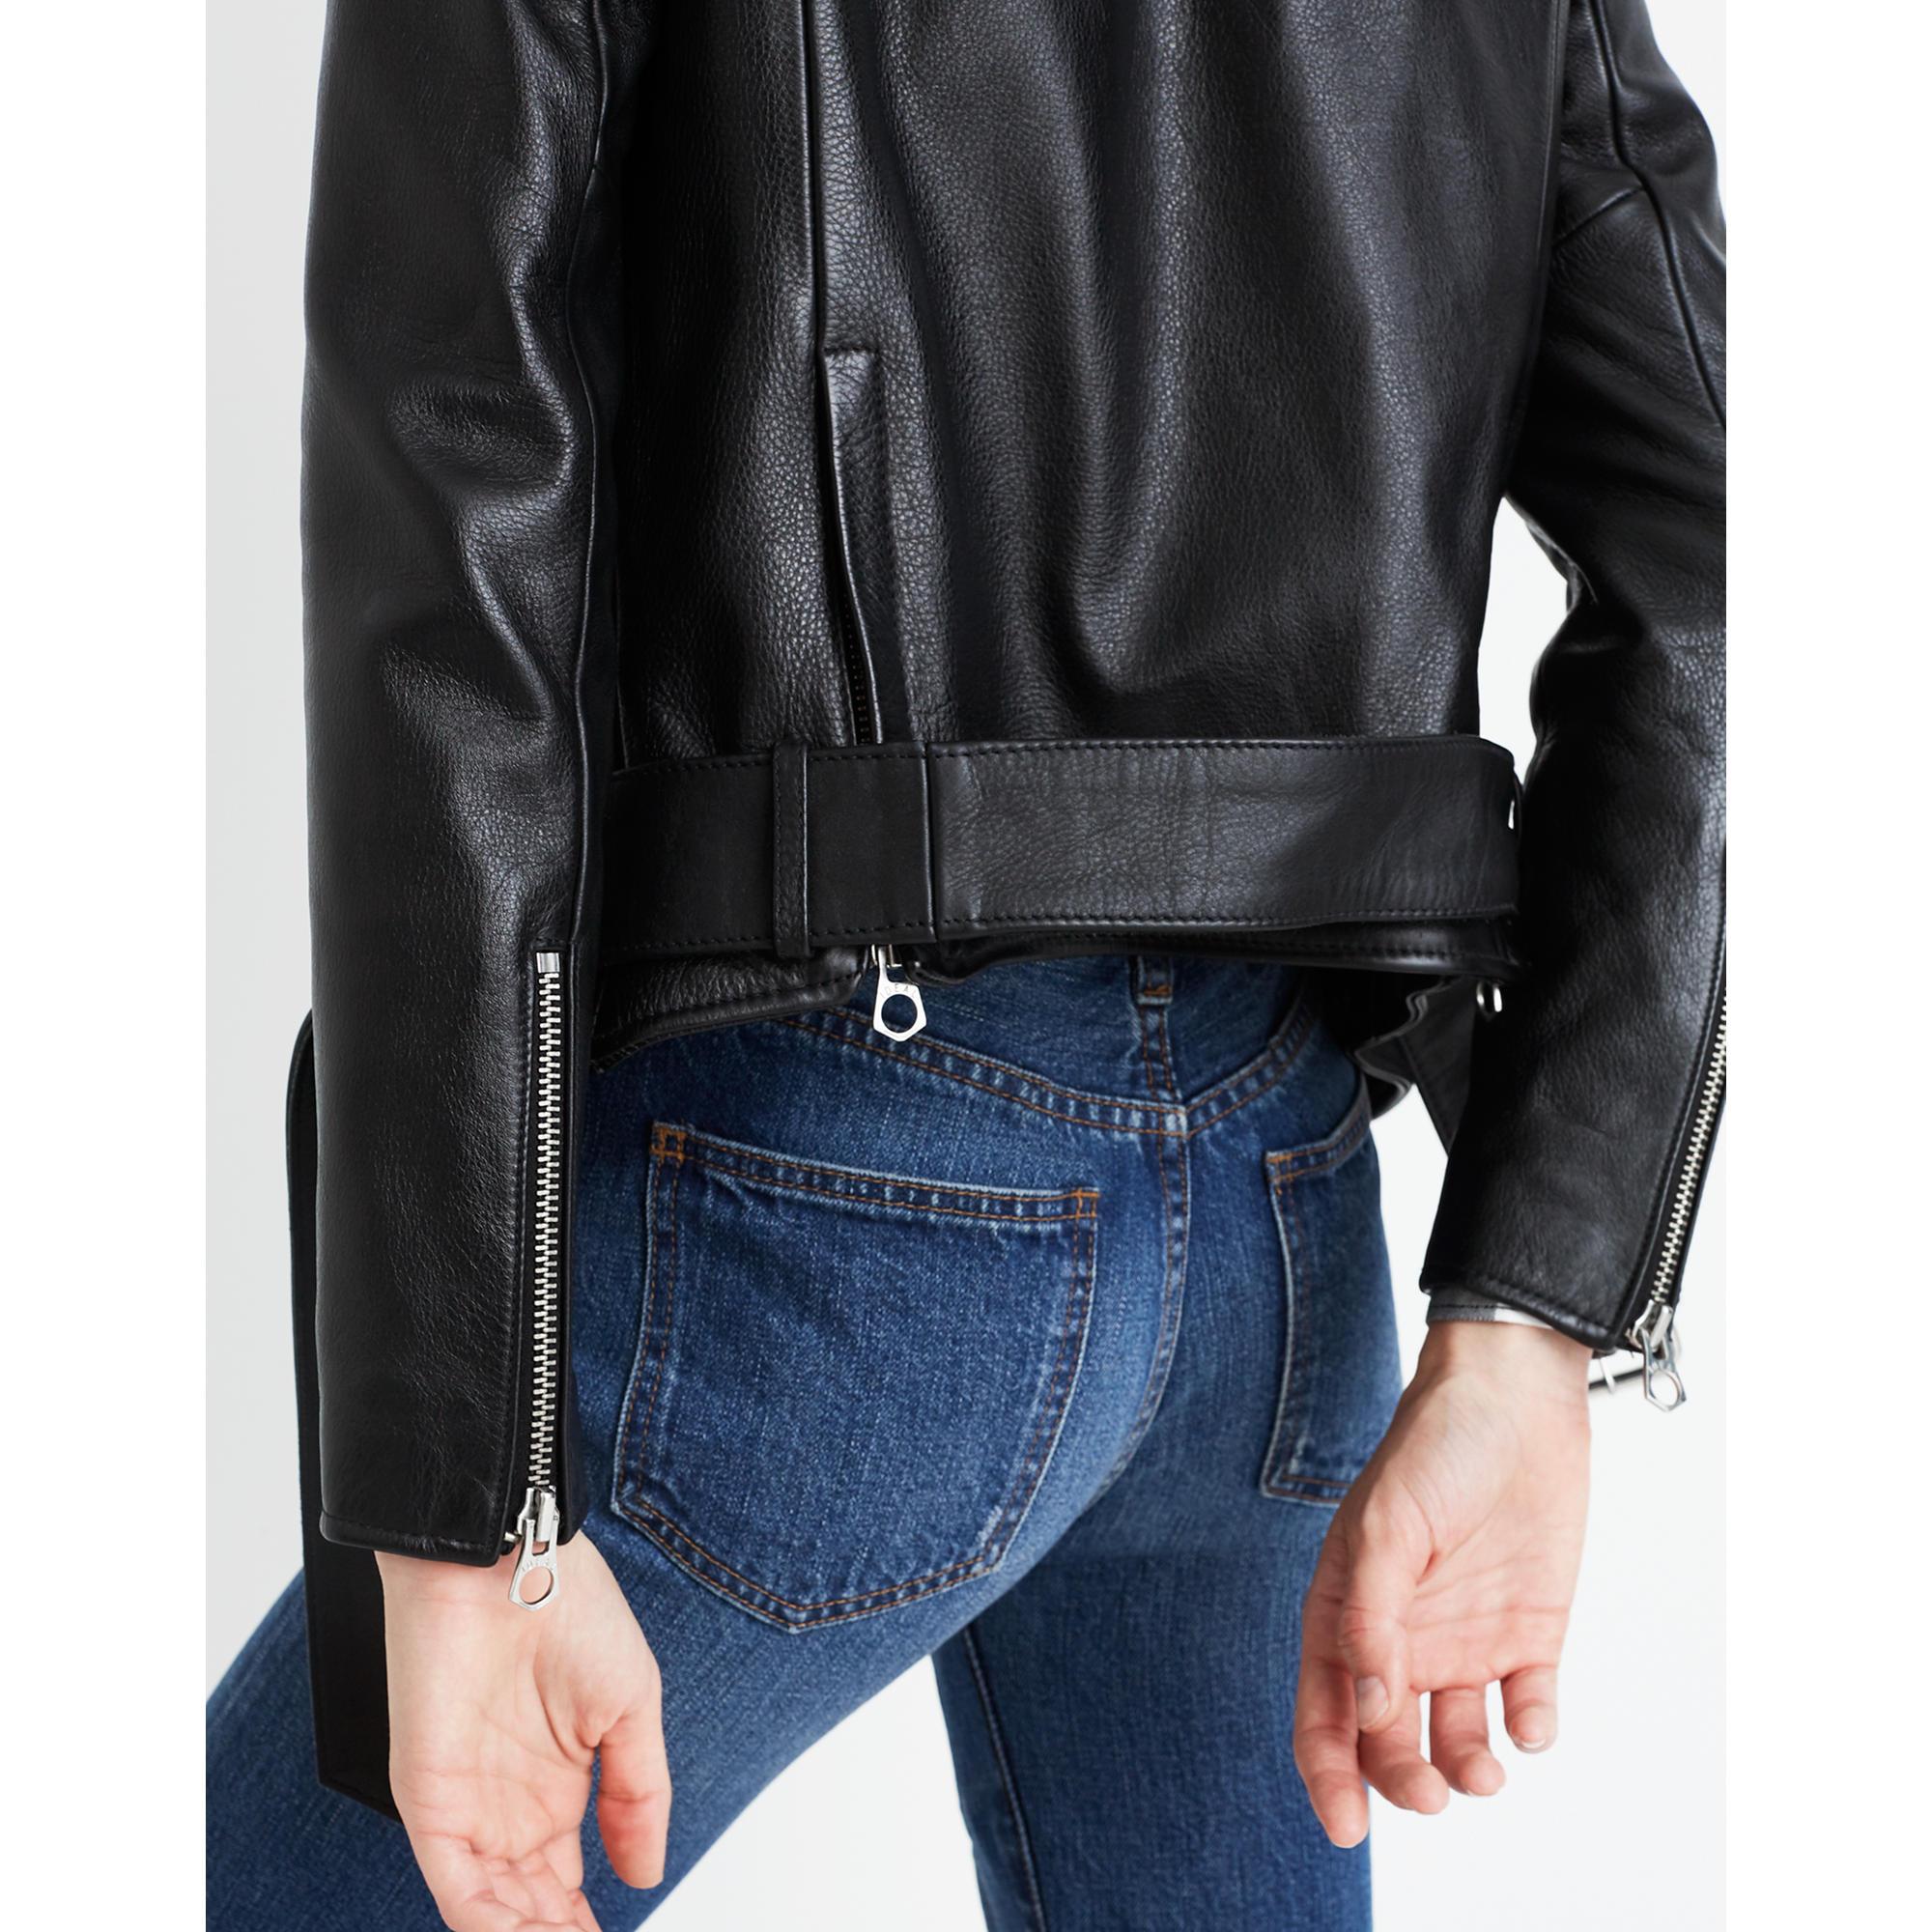 Ultimate Leather Motorcycle Jacket Jackets